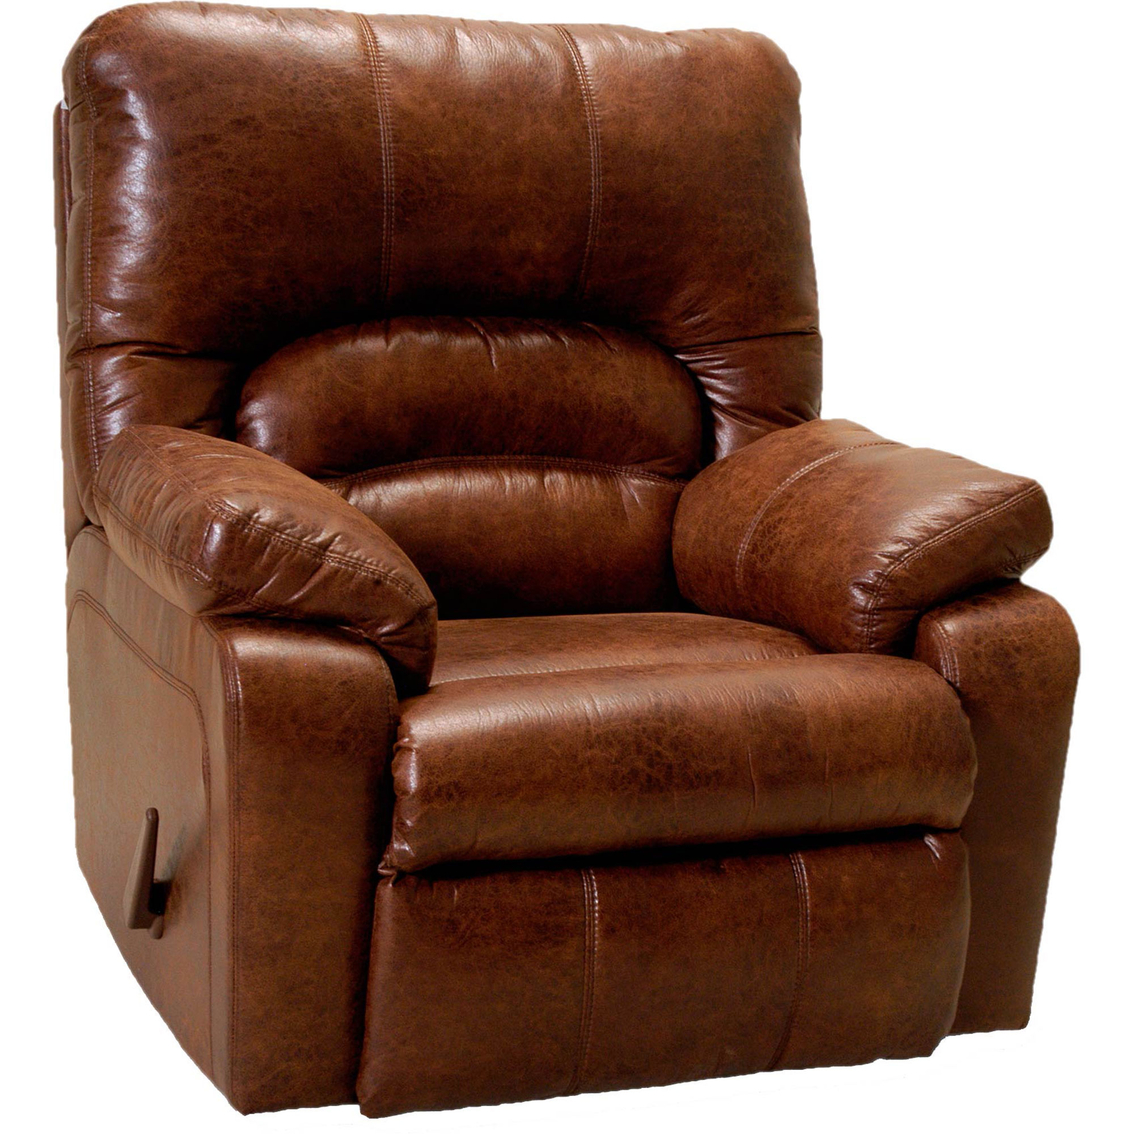 Franklin Dakota Rocker Recliner Chairs Recliners Home Applian